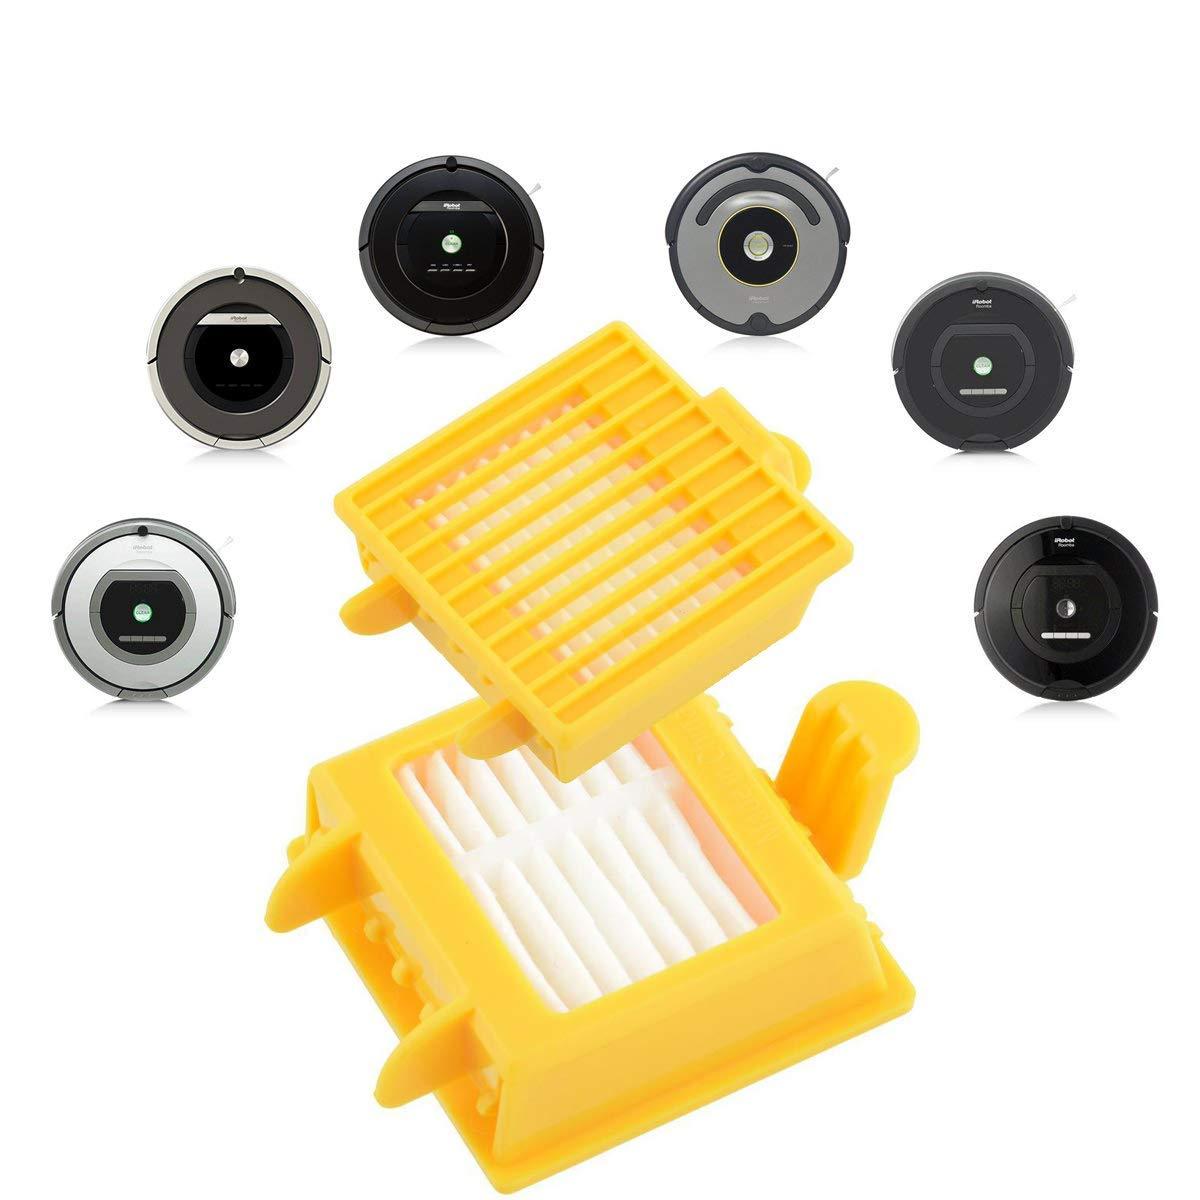 a SUPON Kit de reemplazo Roomba Kit de Accesorio de reemplazo para iRobot Roomba 700 Series 700 720 750 760 770 772 774 775 776 780 782 785 786 786p 790 Repuesto del Filtro